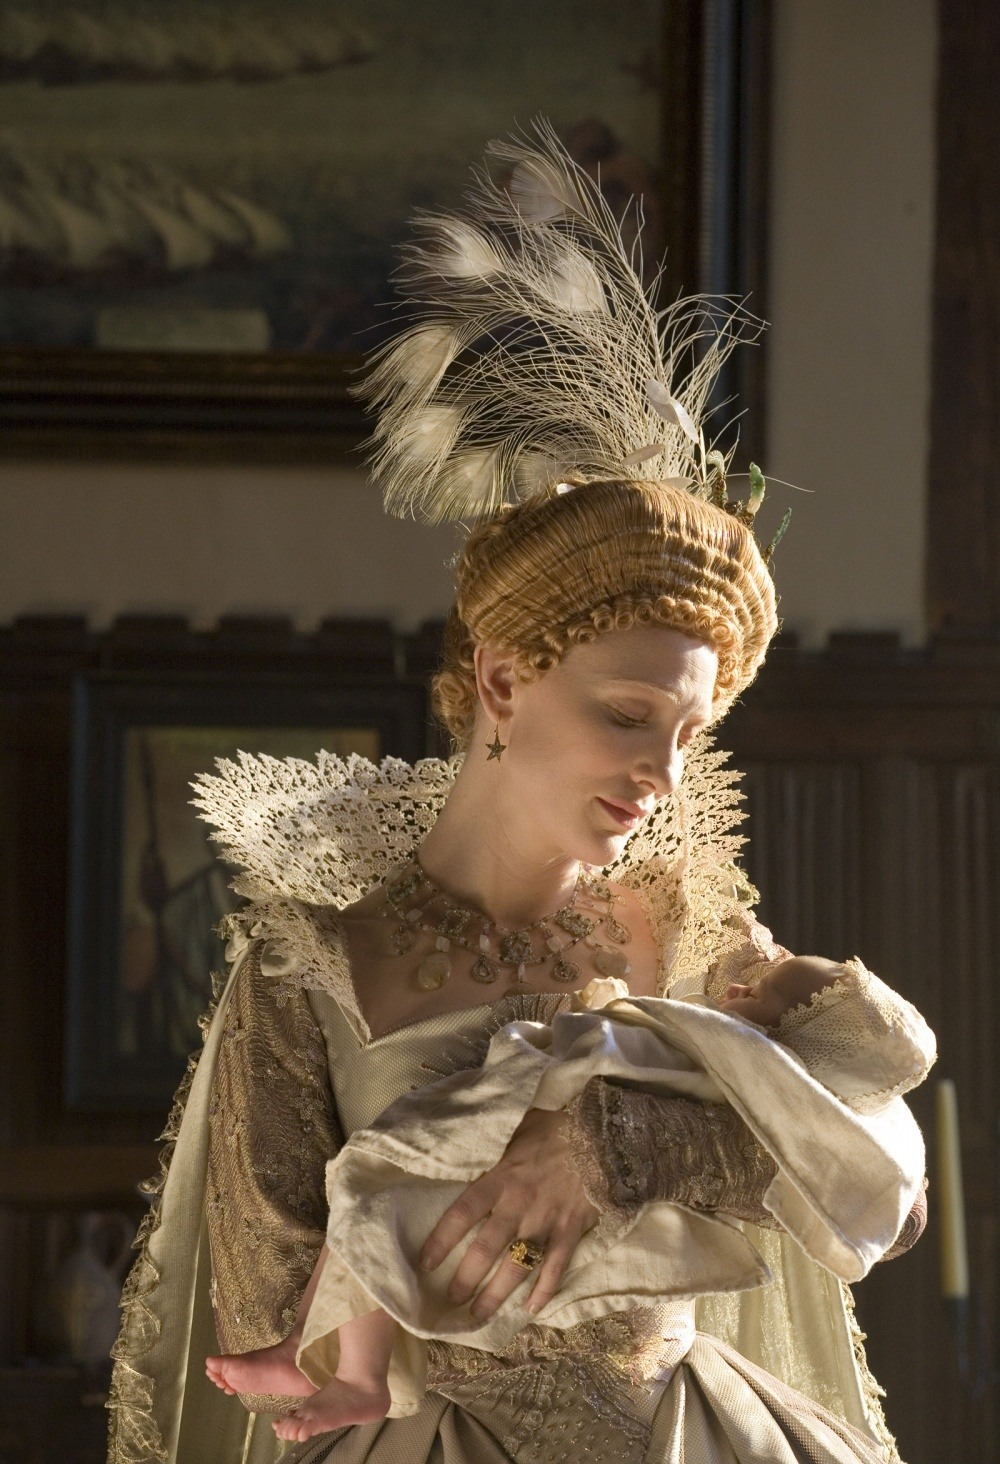 queen elizabeth golden age Elizabeth: the golden age queen elizabeth's to the critically acclaimed 1998 biopic elizabeth that explores the 16th century romance.